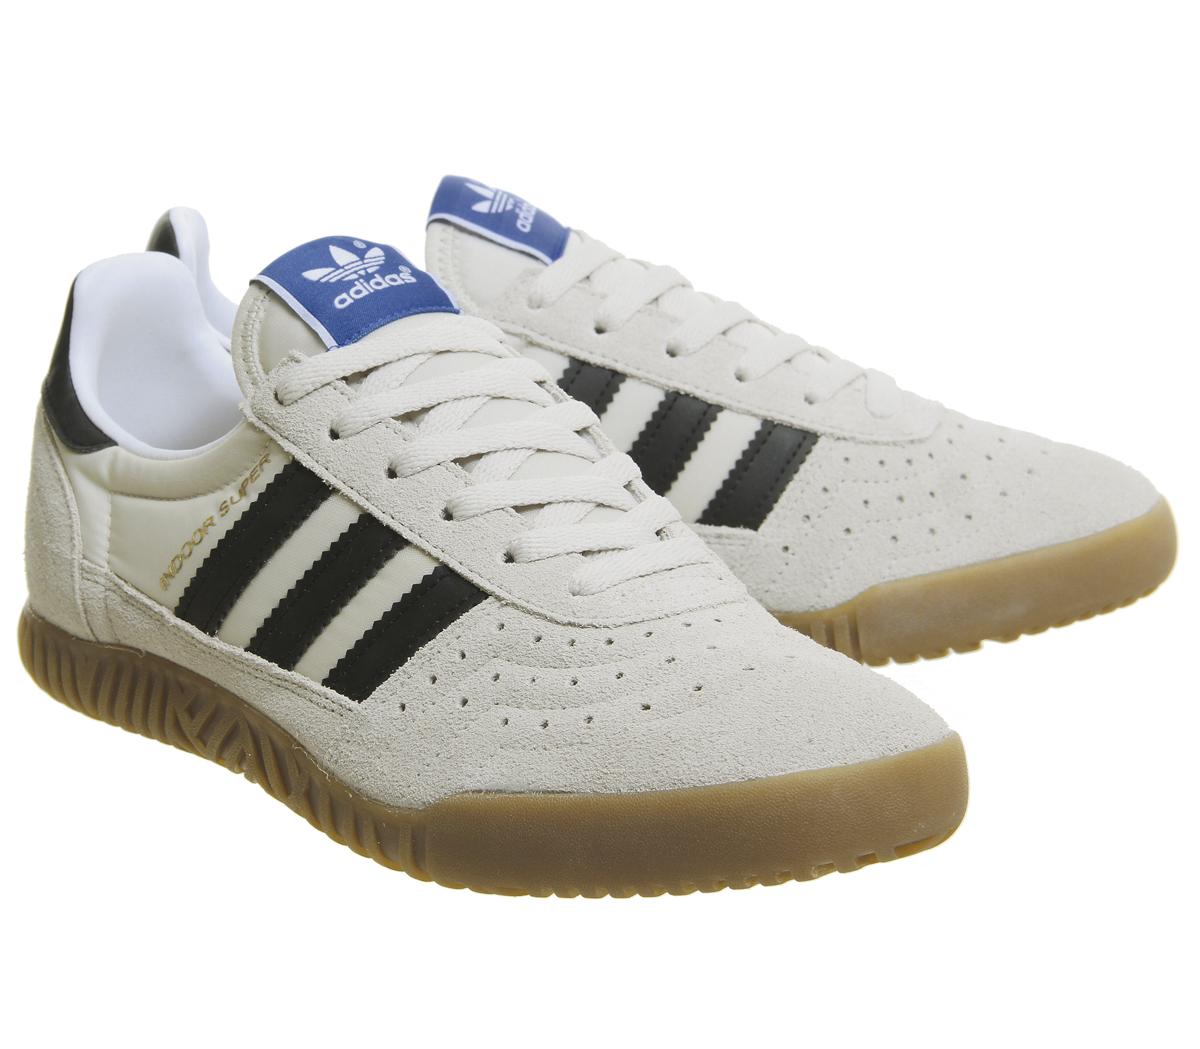 e03fcc4995a32e Adidas indoor Super Baskets Clair Marron Core Black Gum Baskets ...